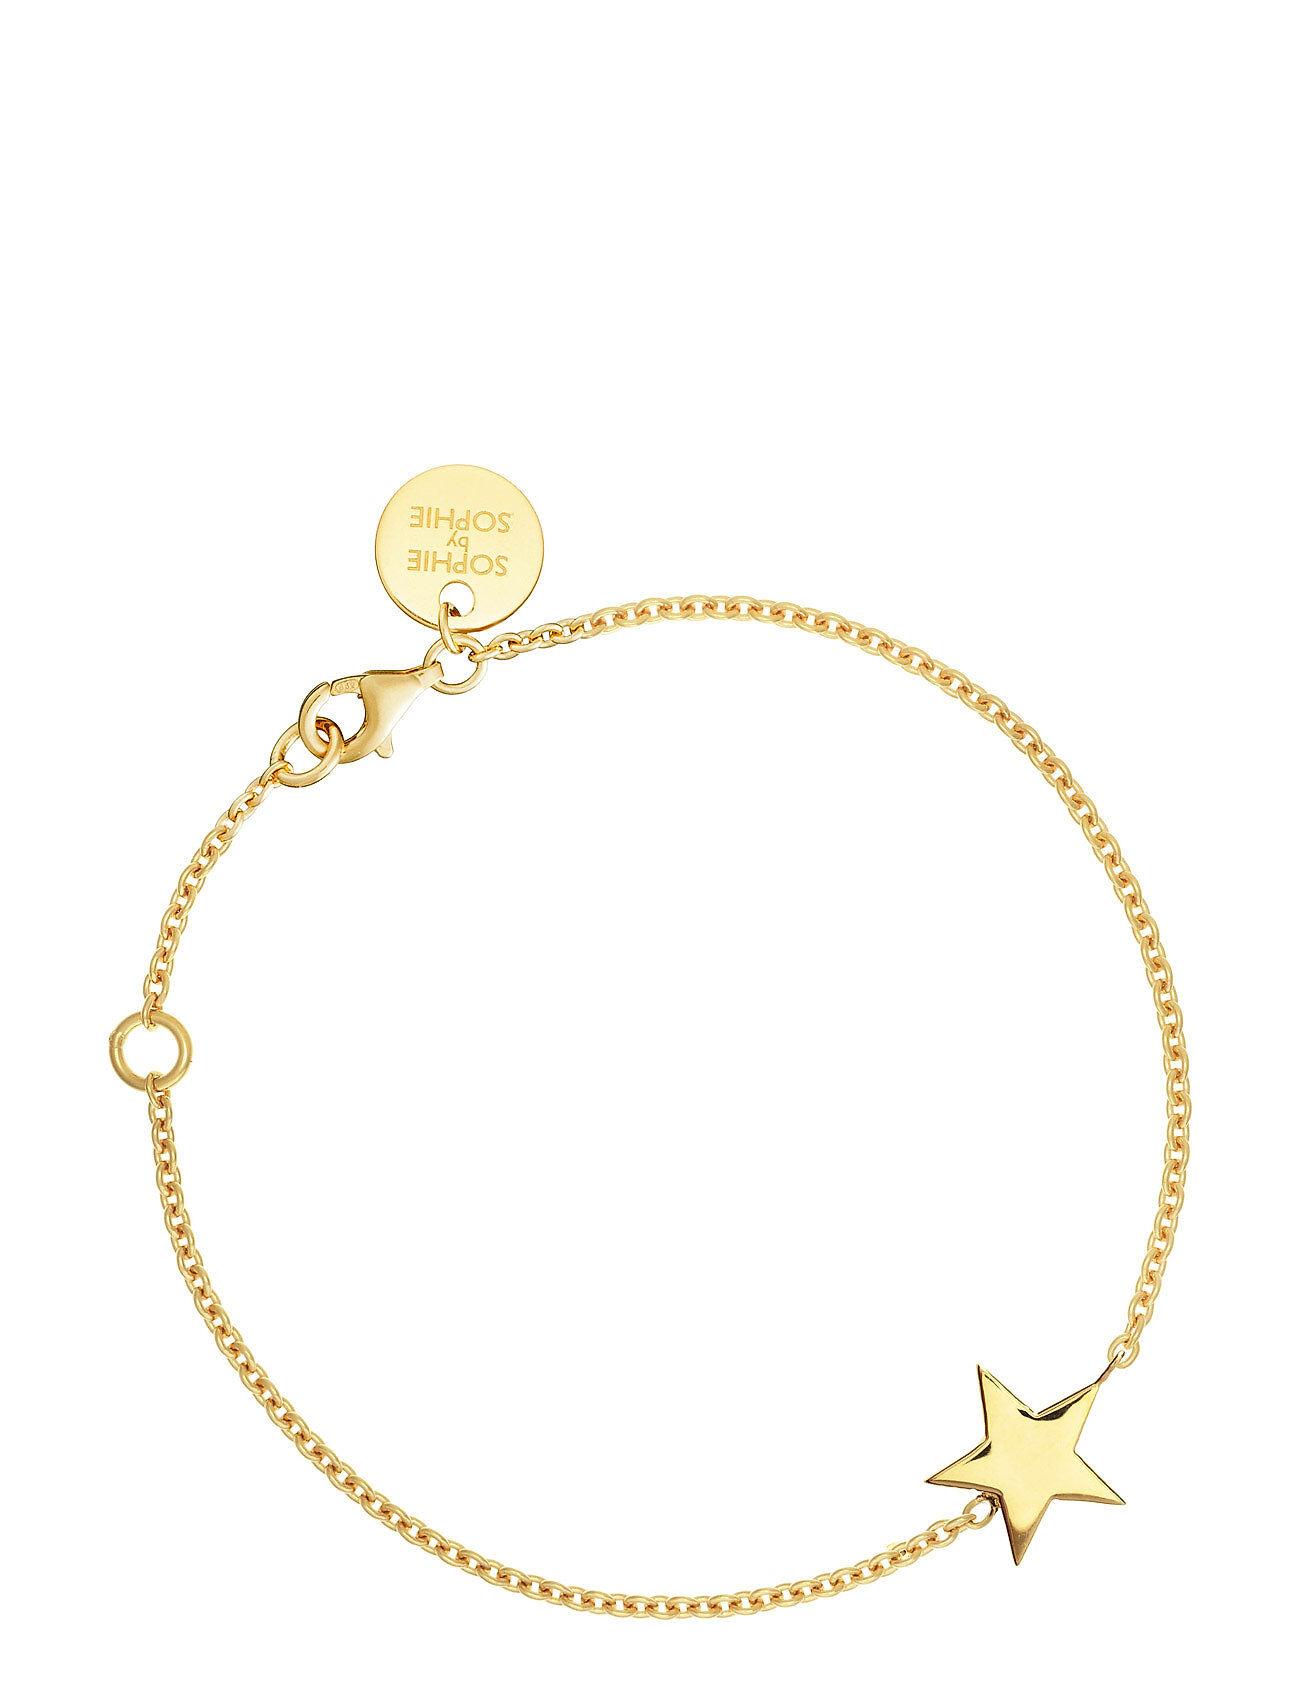 SOPHIE by SOPHIE Star Bracelet Accessories Jewellery Bracelets Chain Bracelets Kulta SOPHIE By SOPHIE